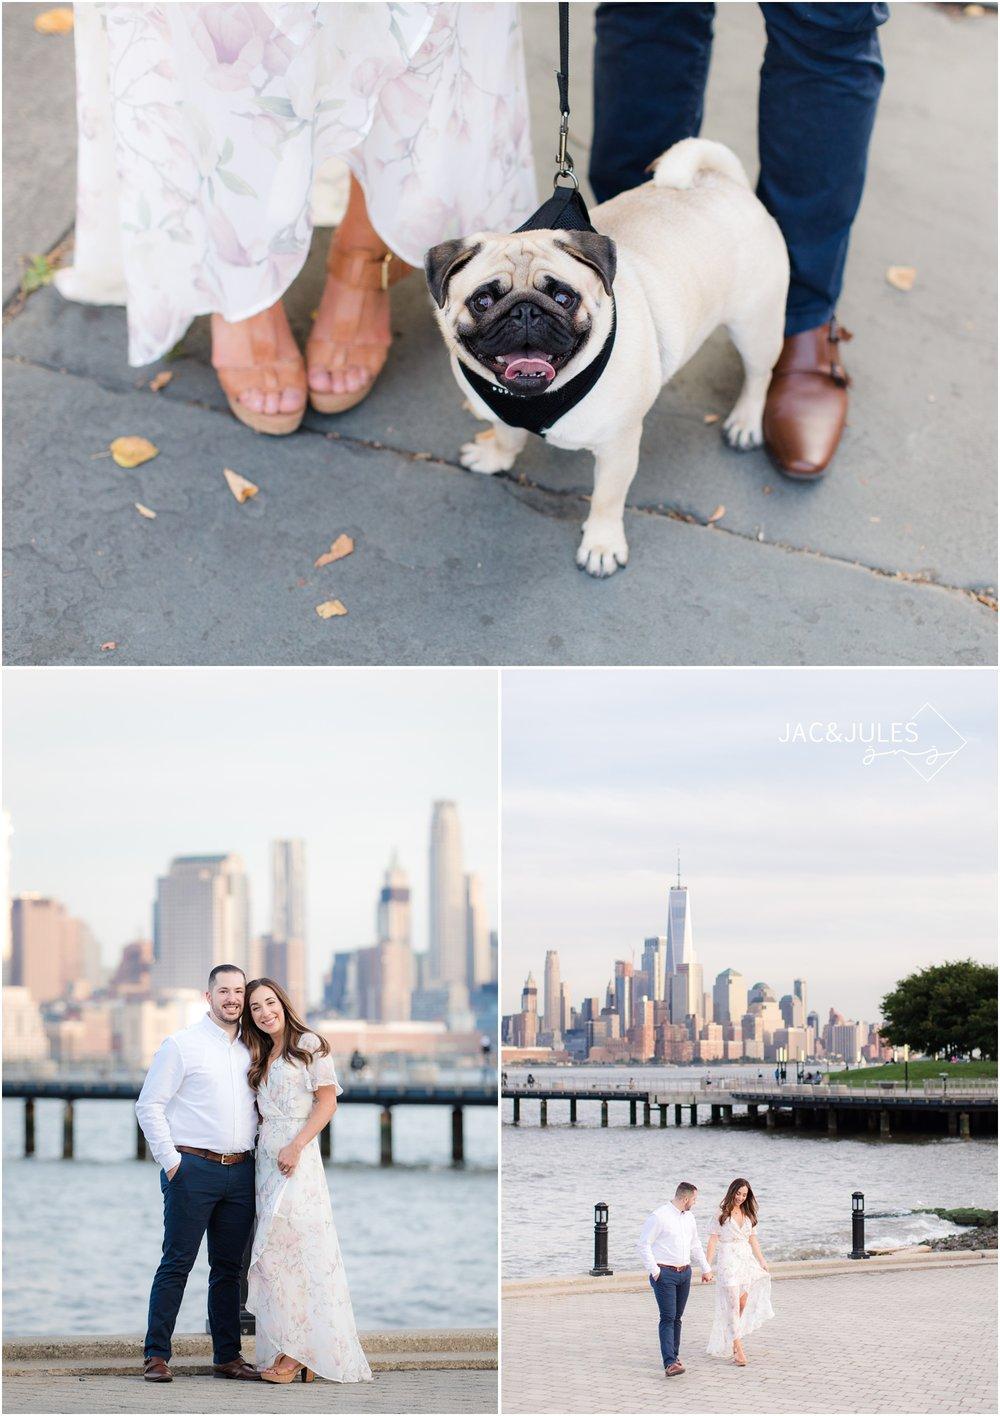 funEngagement photos with NYC skyline in Hoboken, NJ.